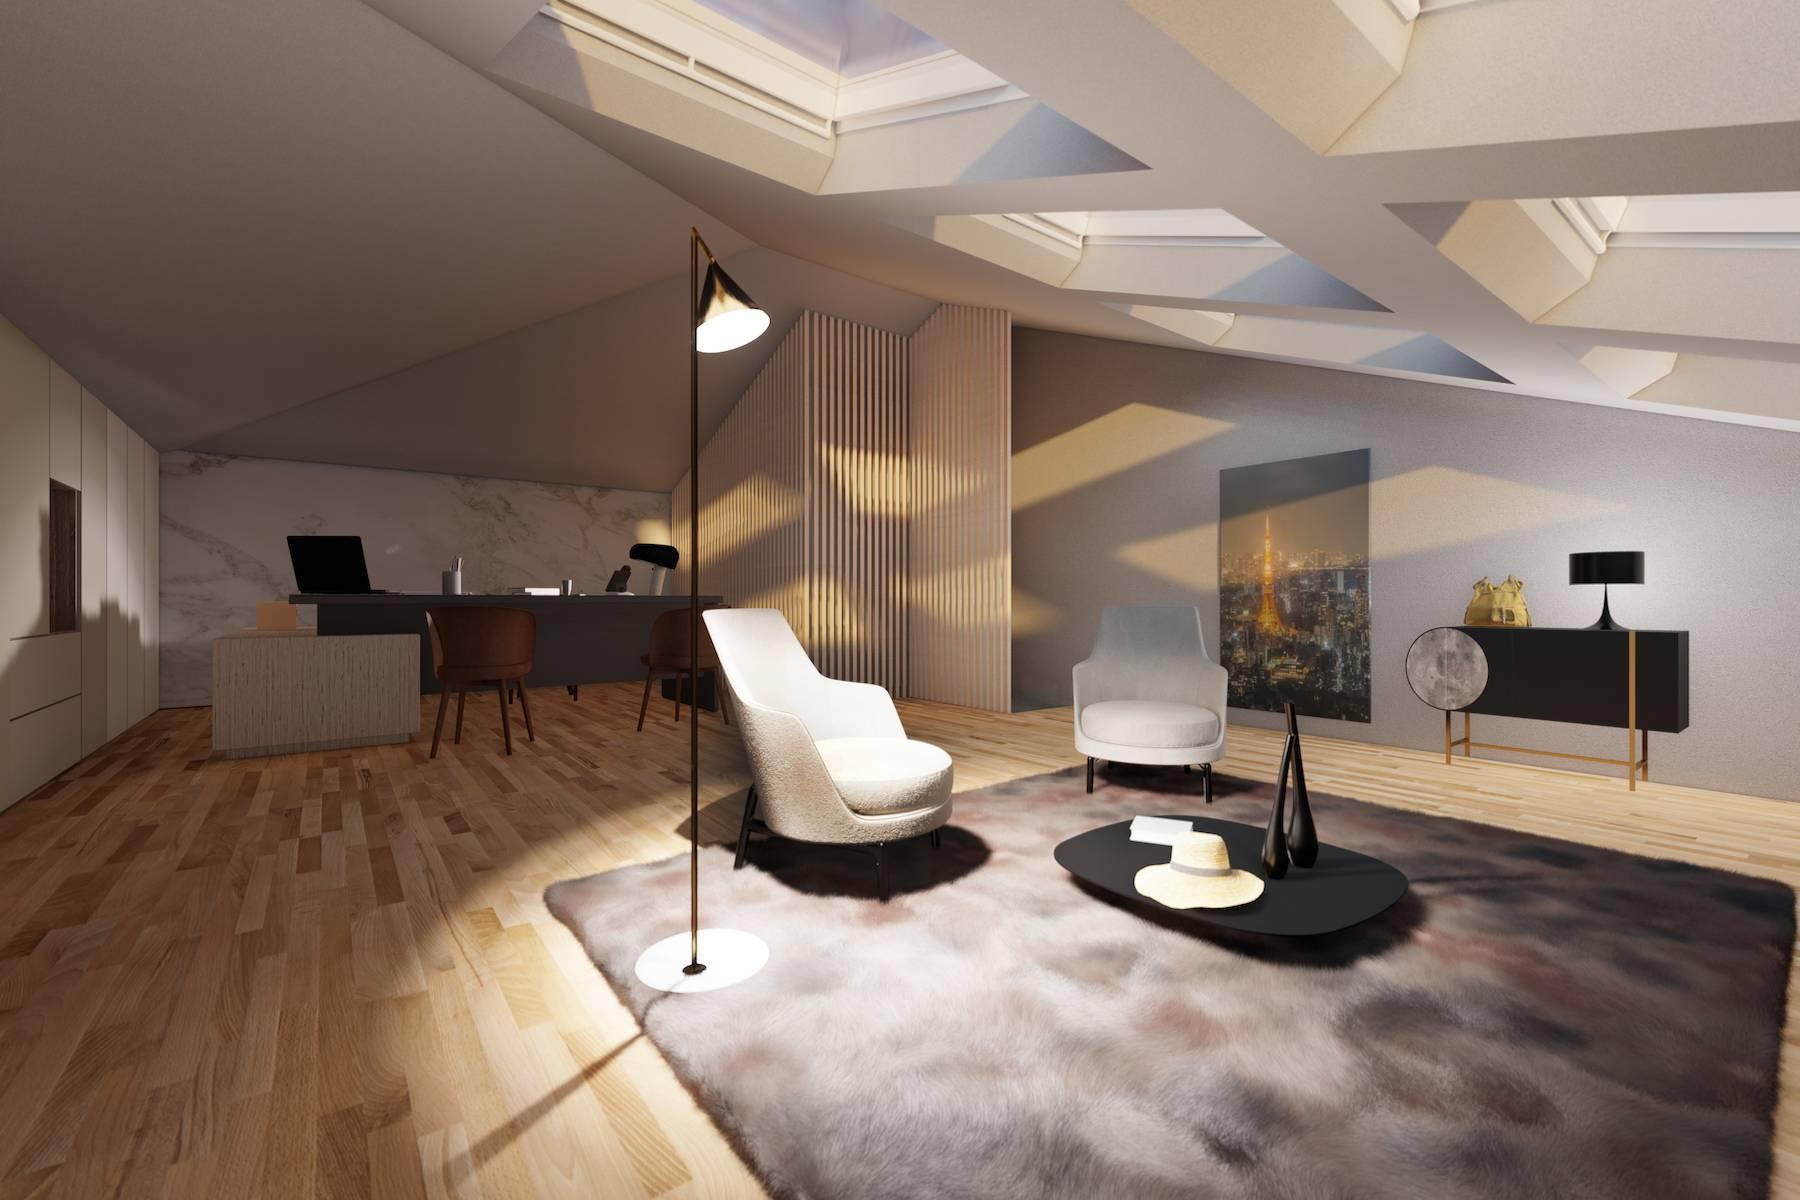 Luxury seafront penthouse in Viareggio - 3